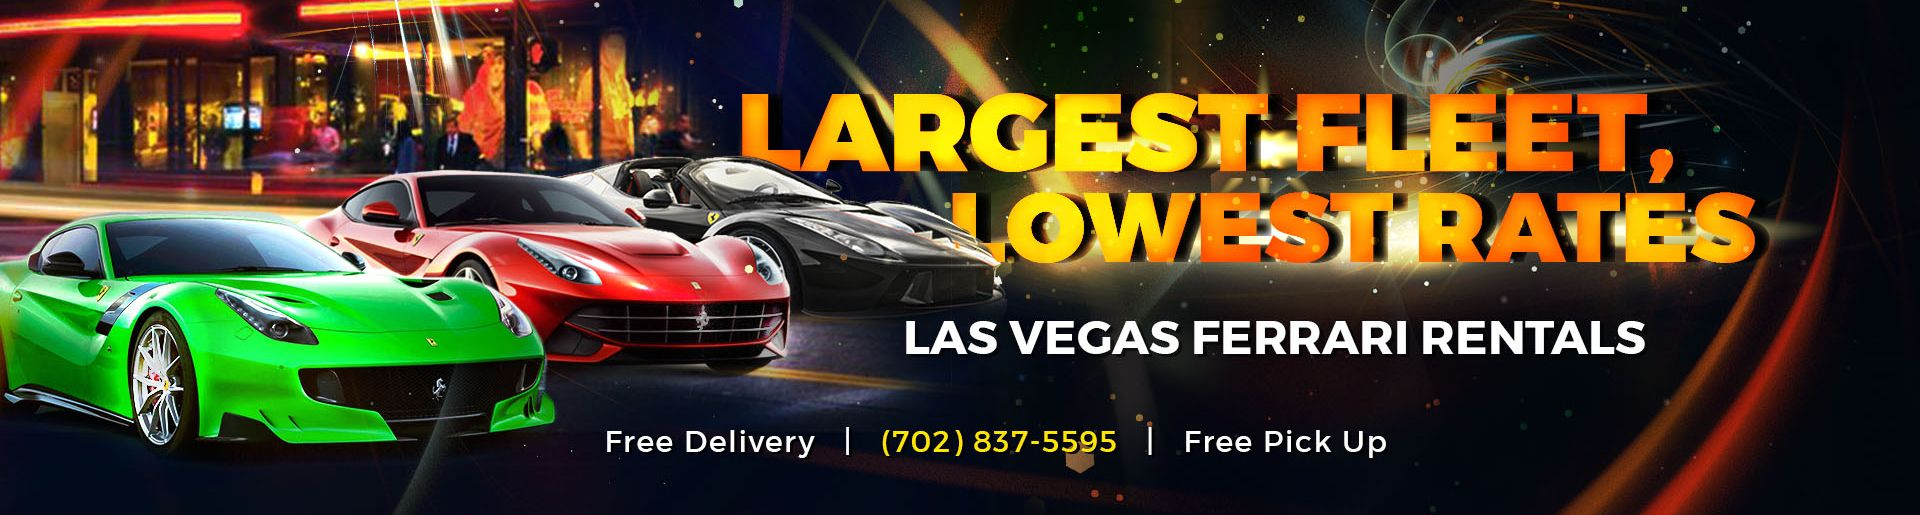 Bmw Car Rental Shoreline Luxury Bmw M6 Convertible Rental Miami